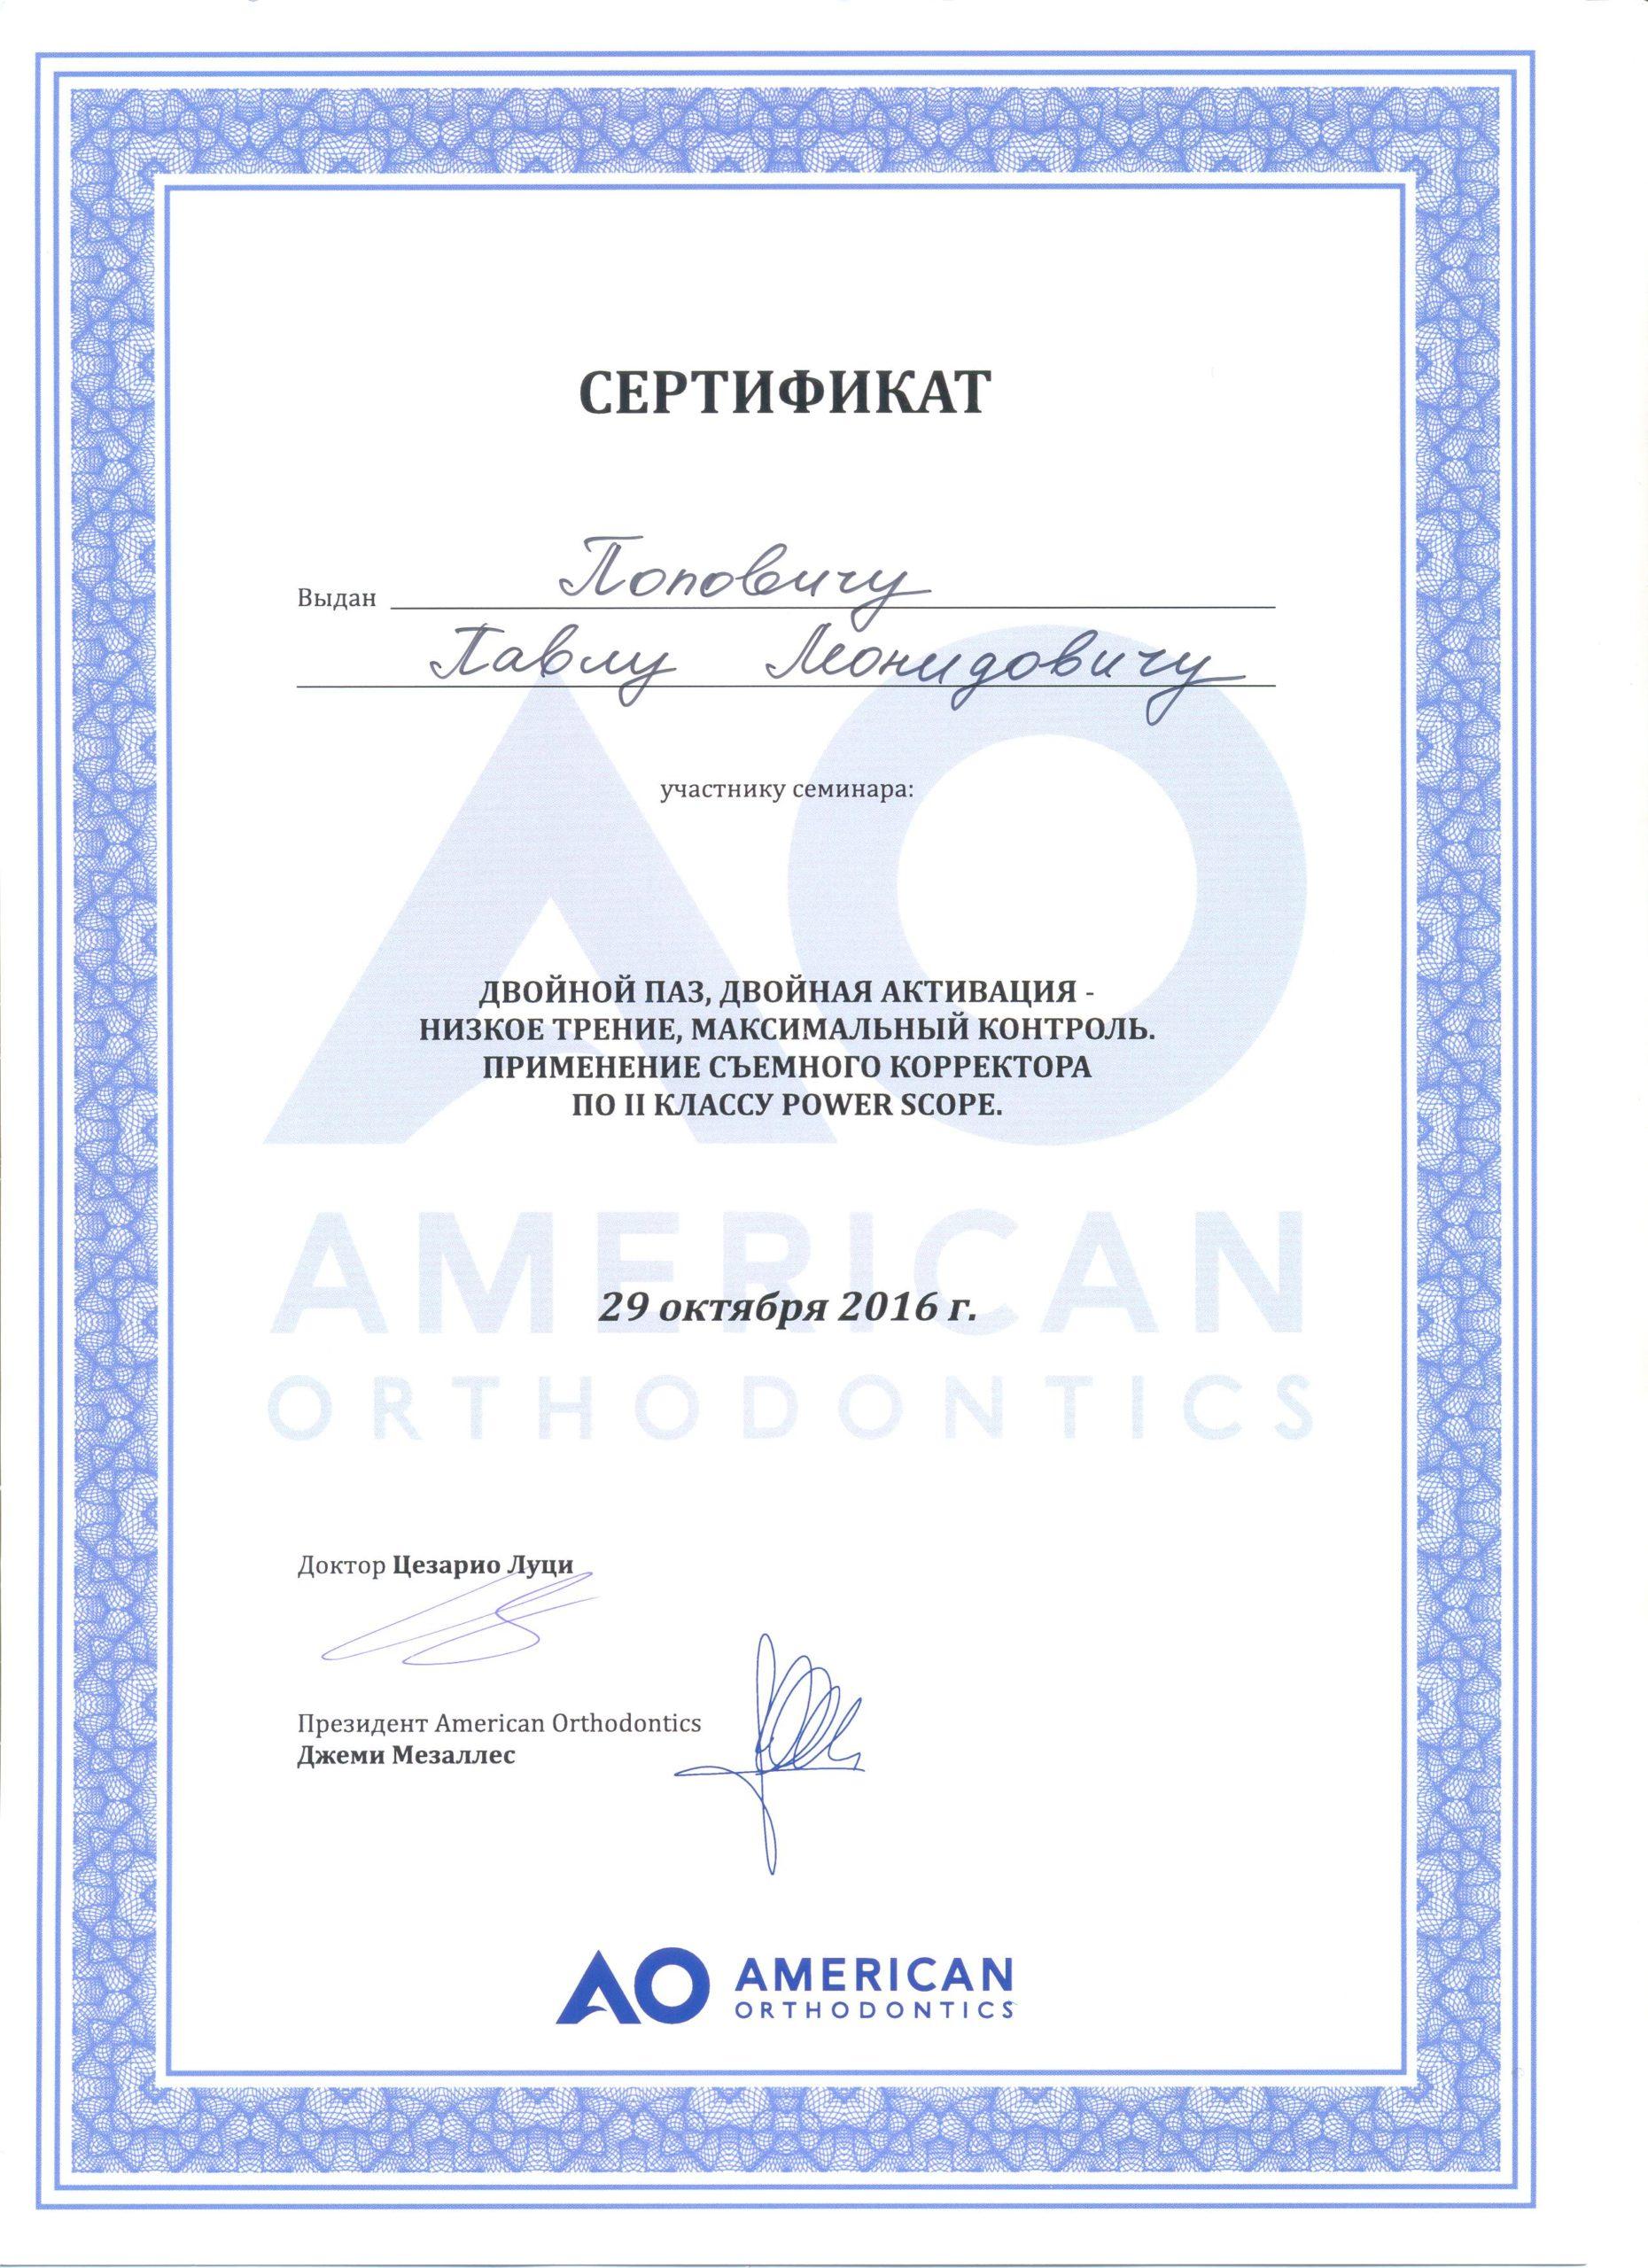 сертификат стоматолога Попович 2016